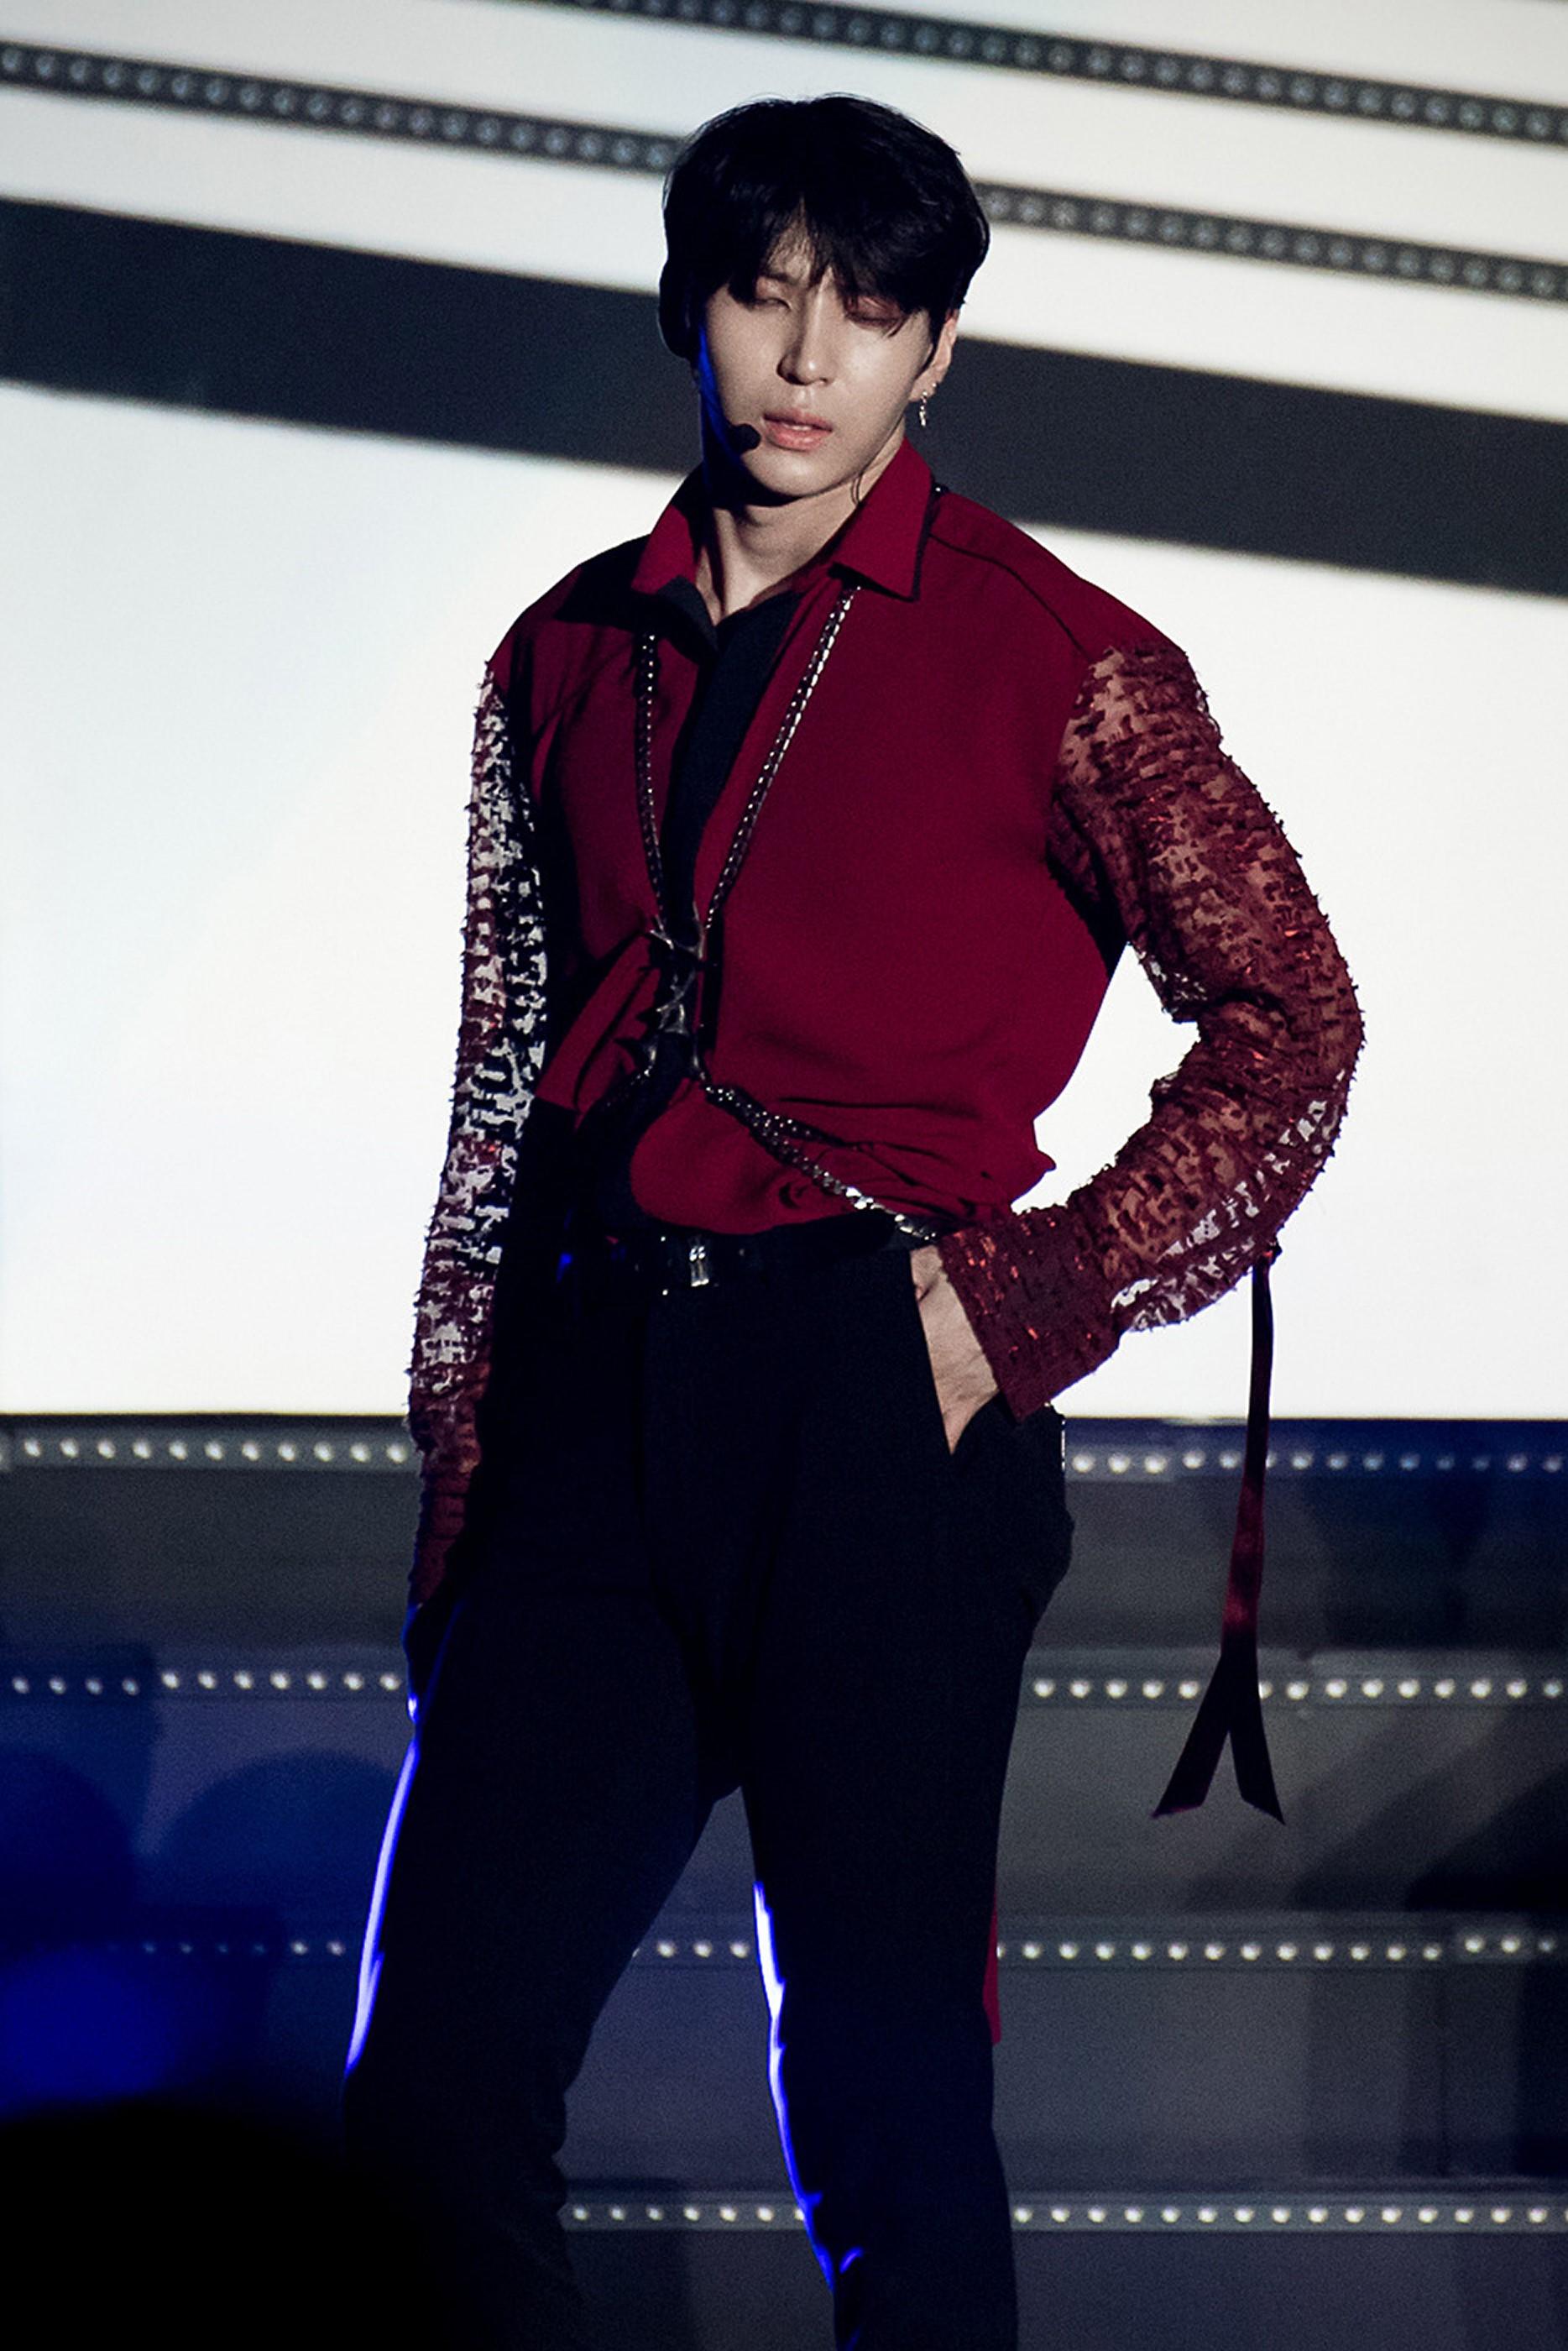 Leo (singer) - Wikipedia